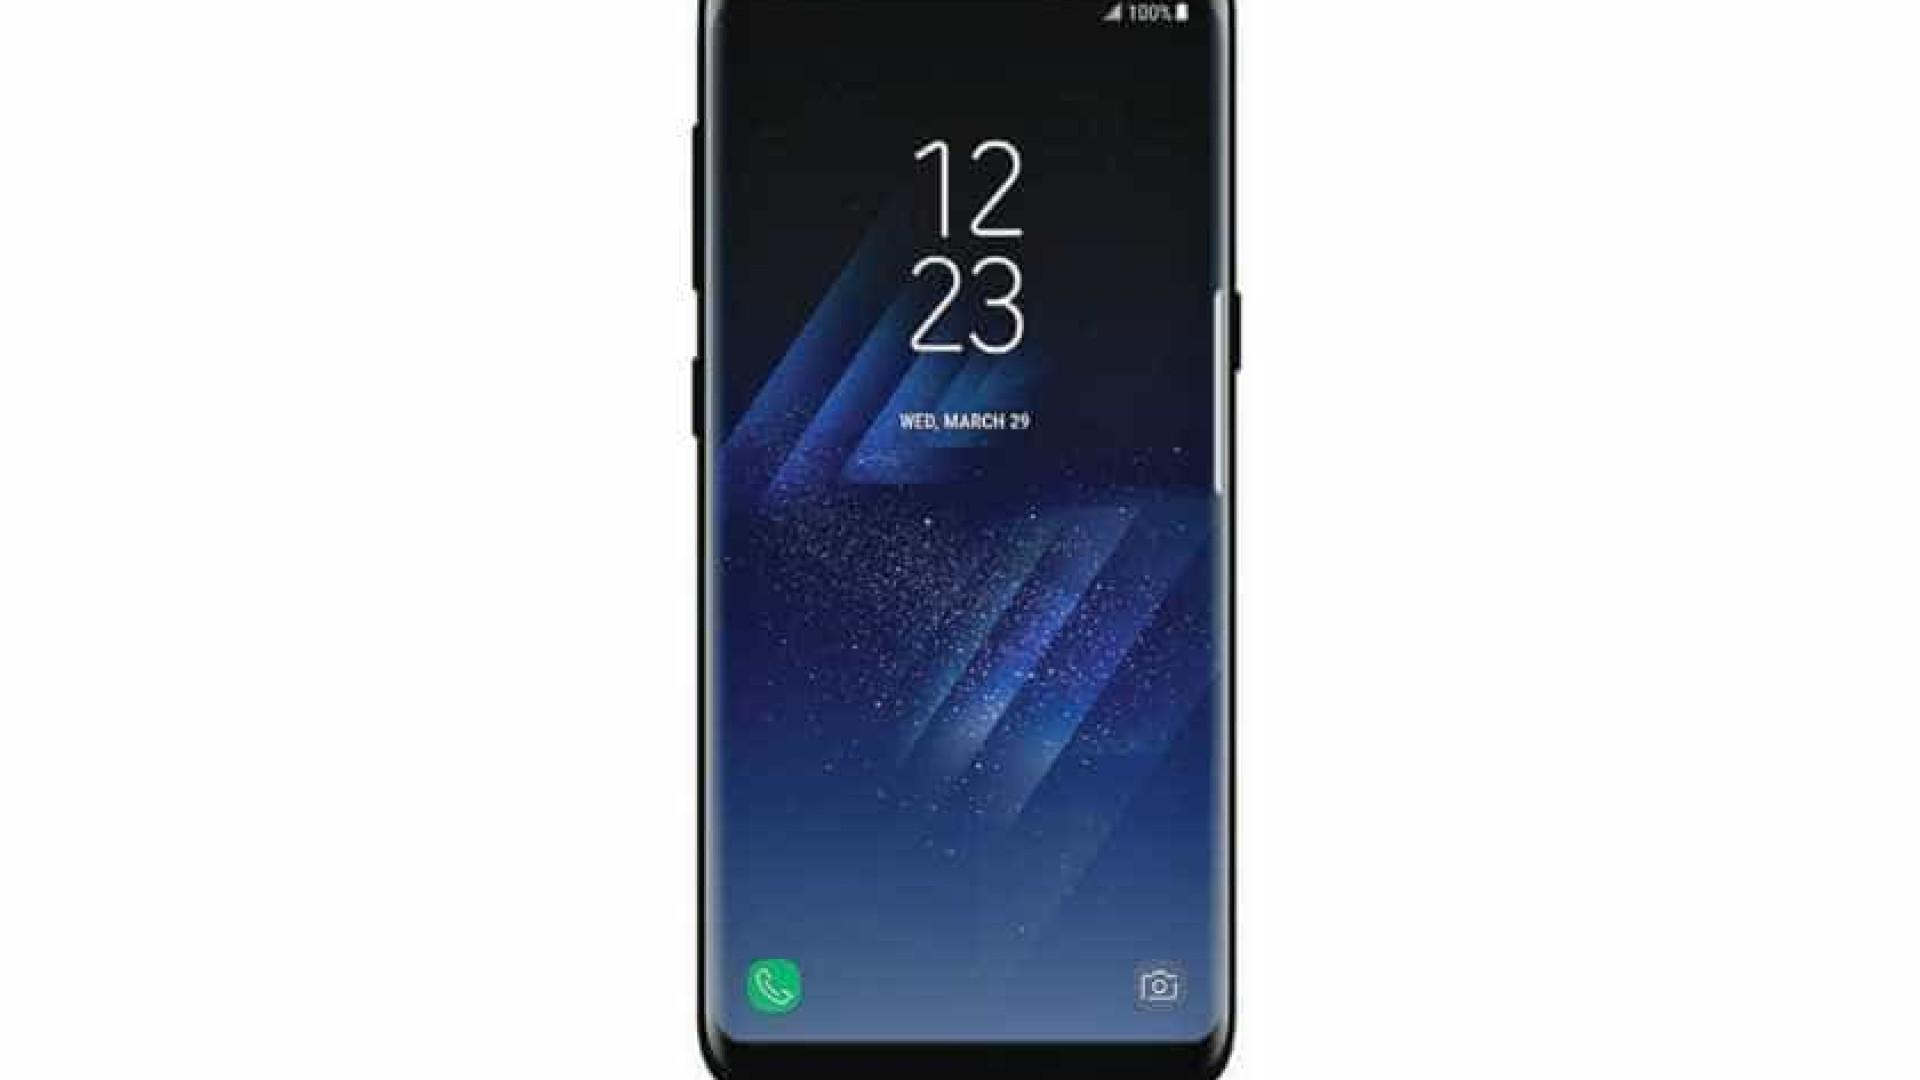 Samsung confirma que mostrará mais do que o Galaxy S8